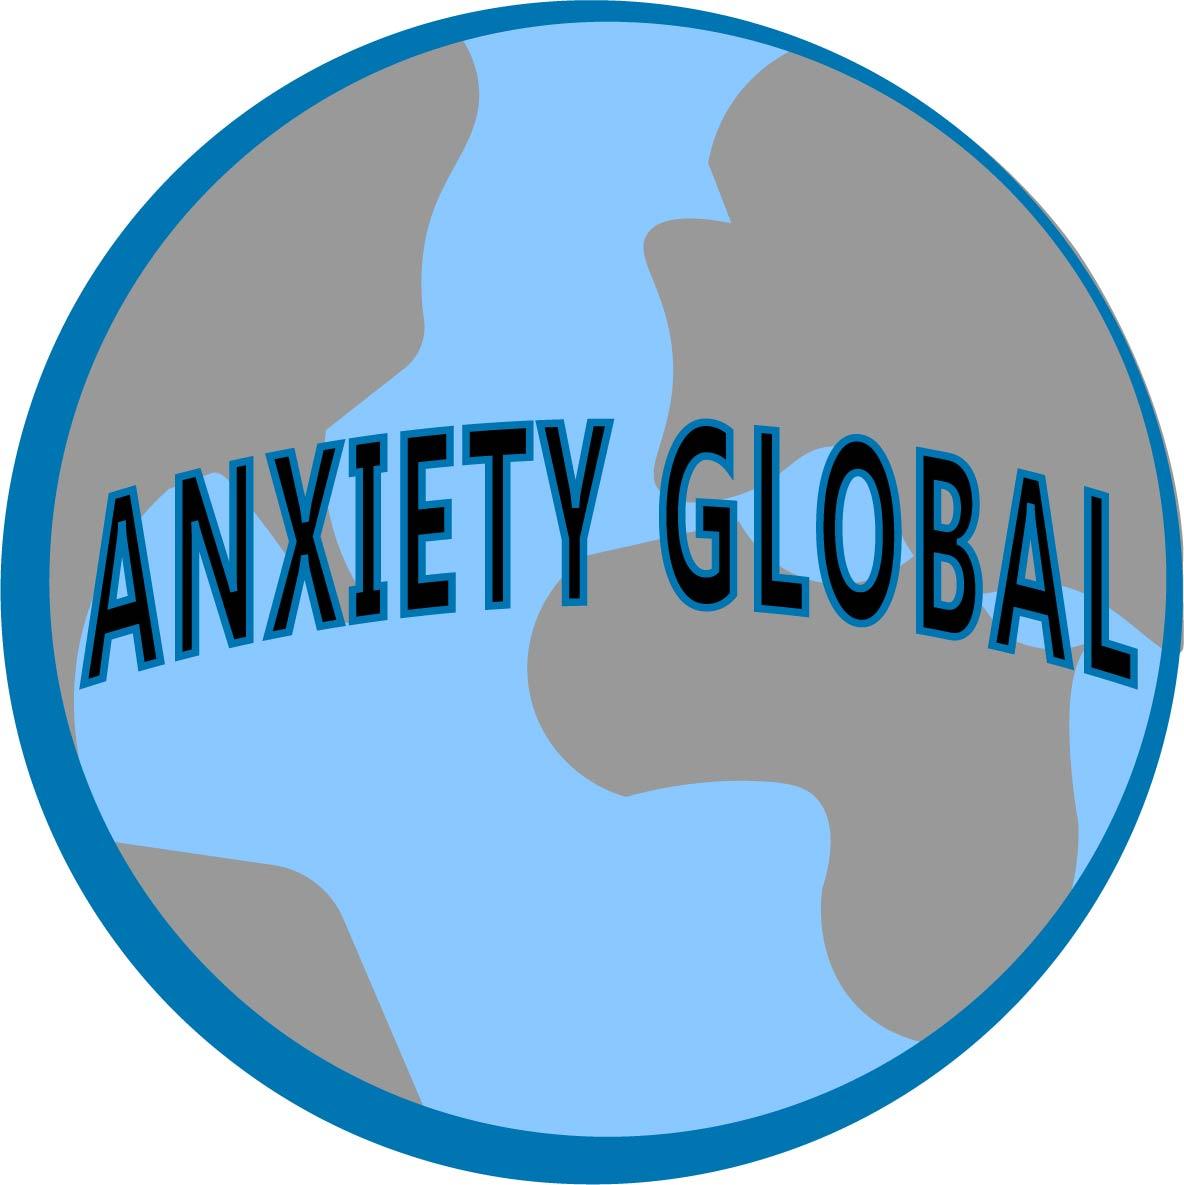 Anxiety Global